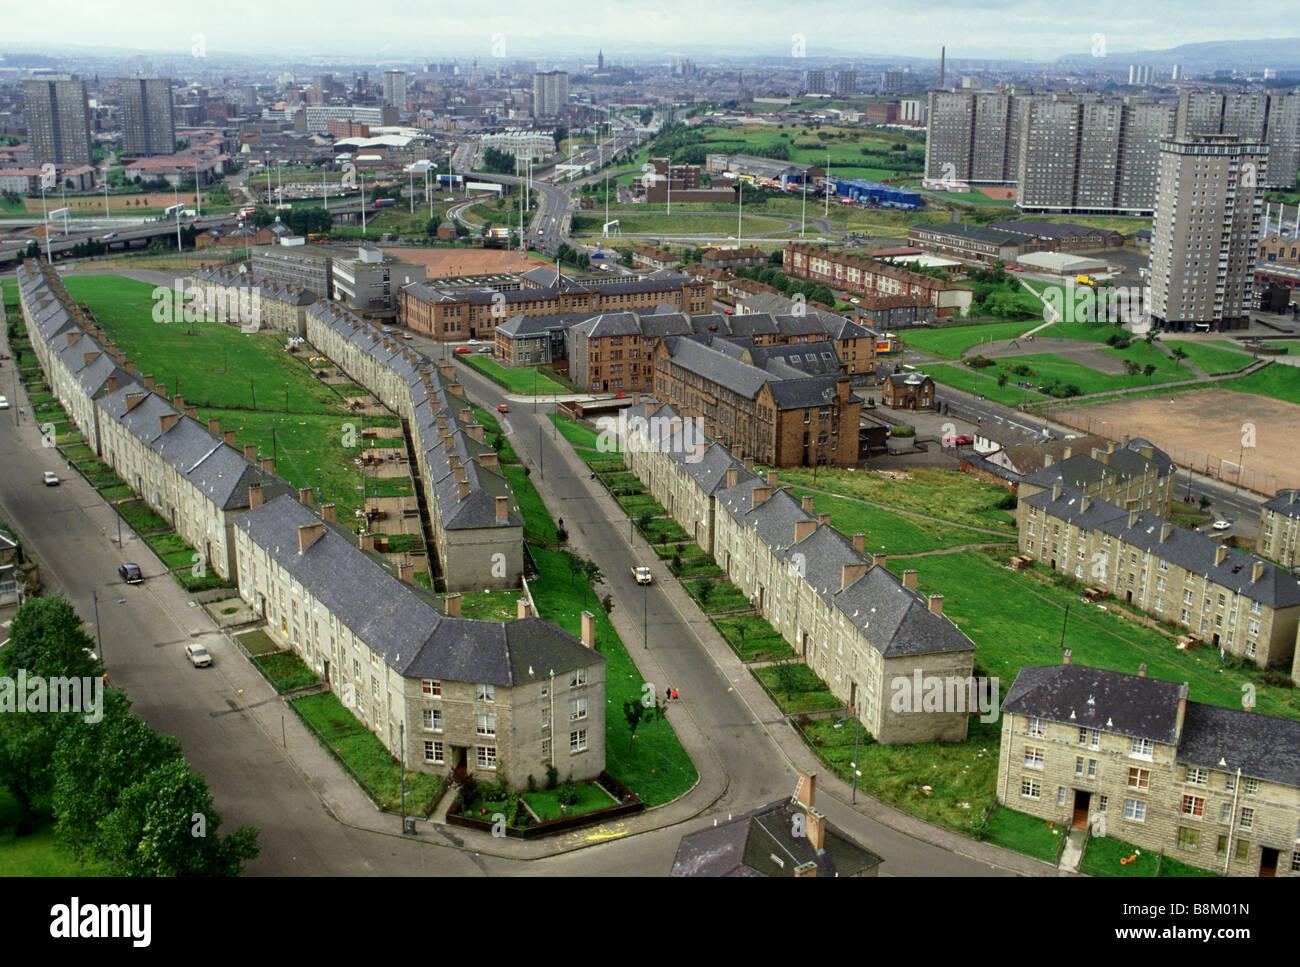 Edinburgh Scotland An aerial view of housing estates in ...